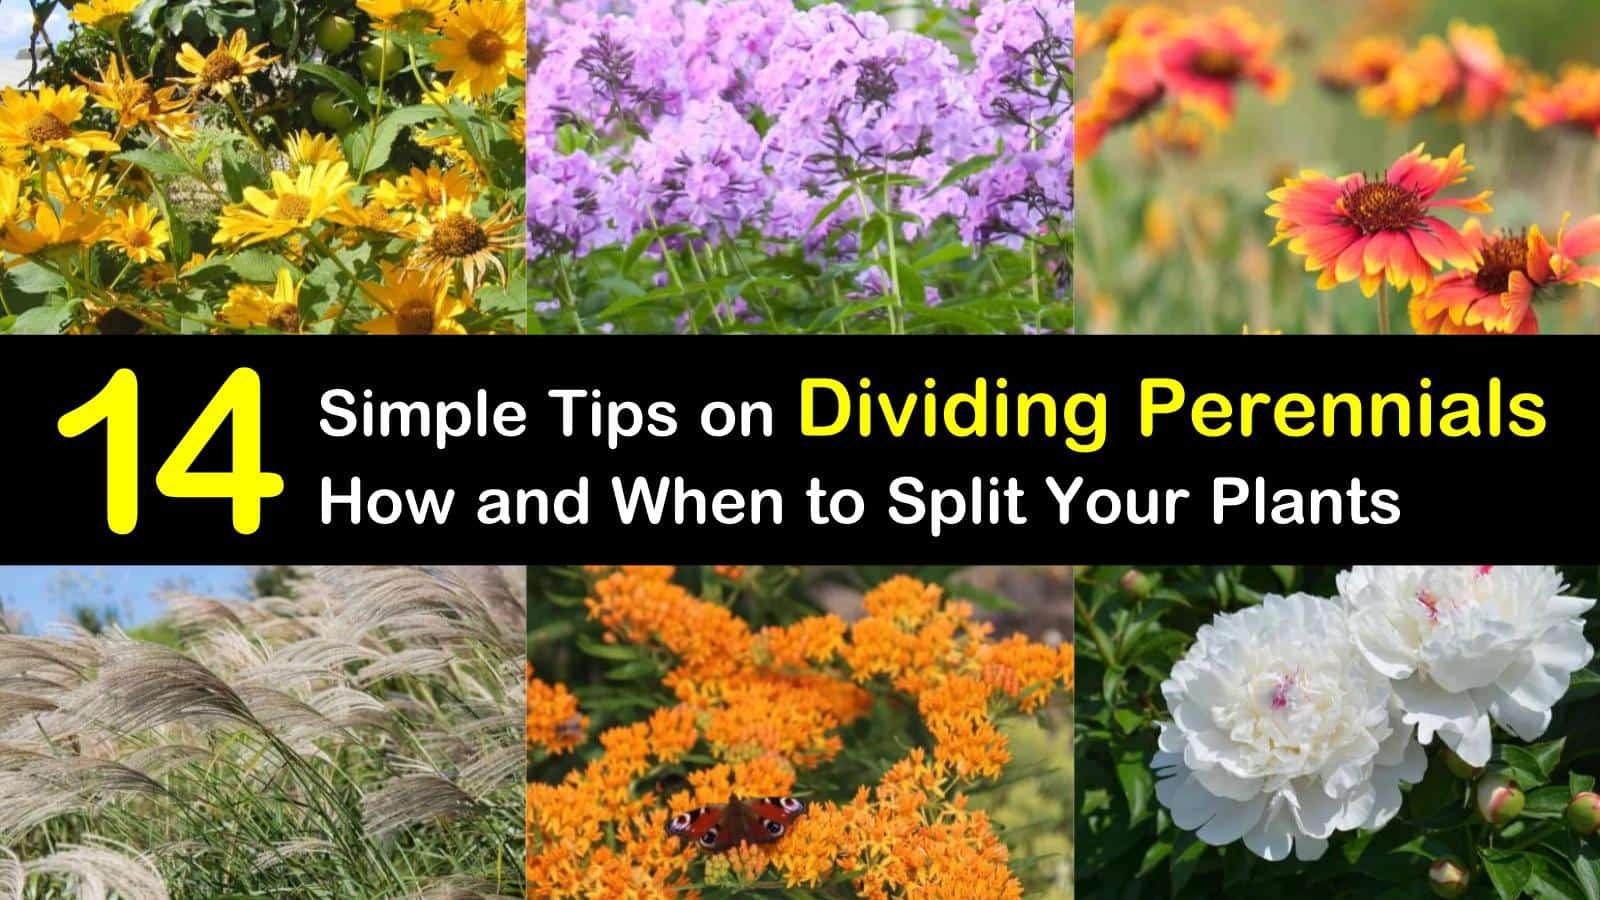 dividing perennials titleimg1